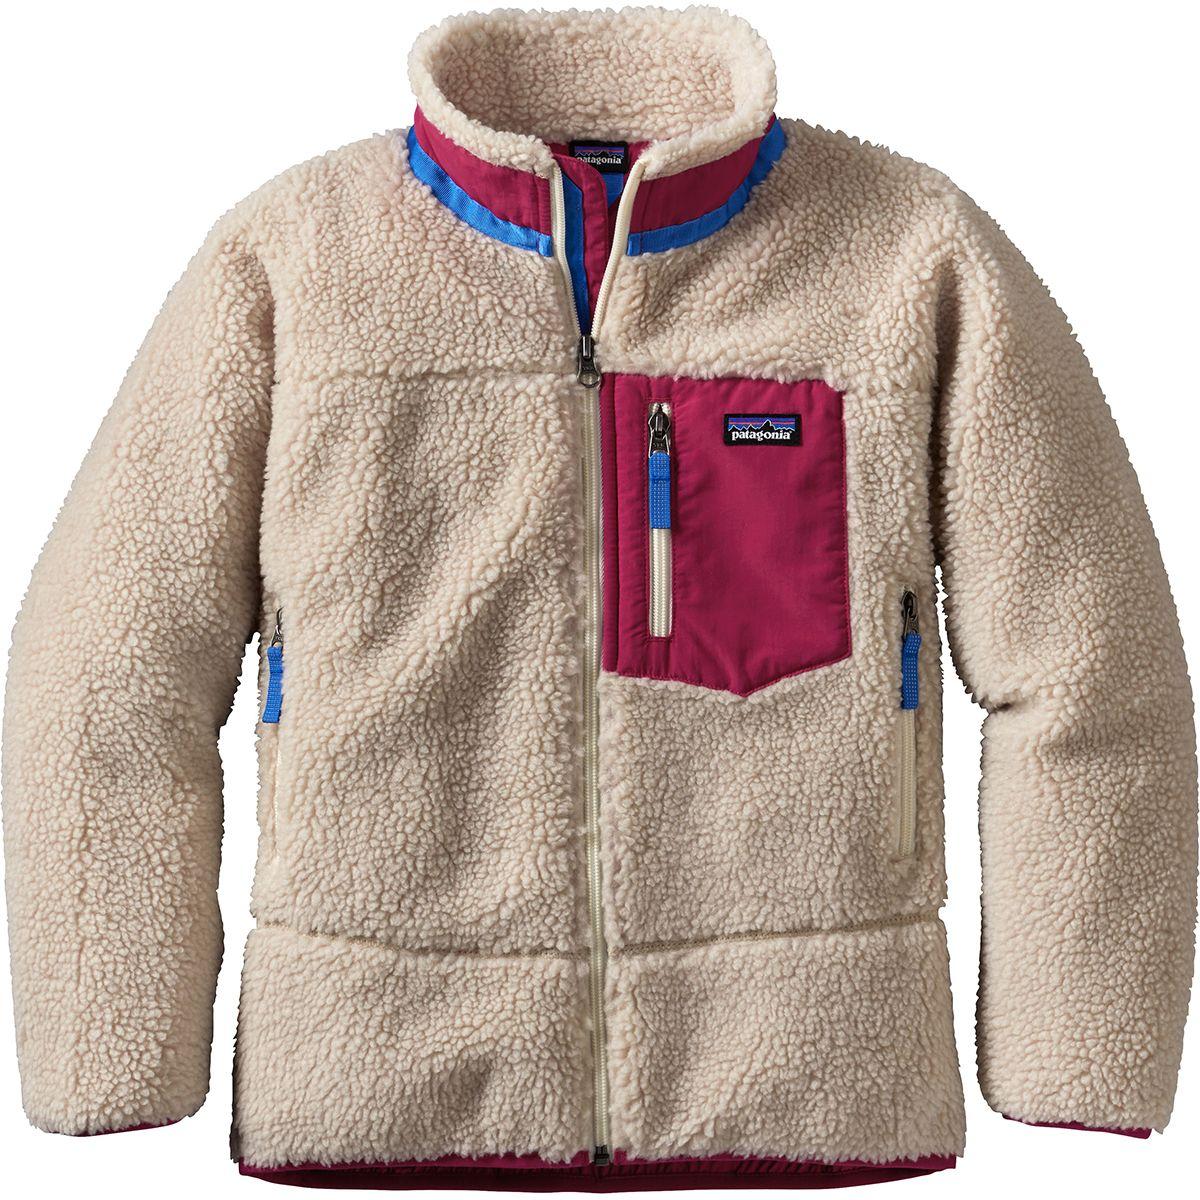 Retro-X Fleece Jacket - Girls